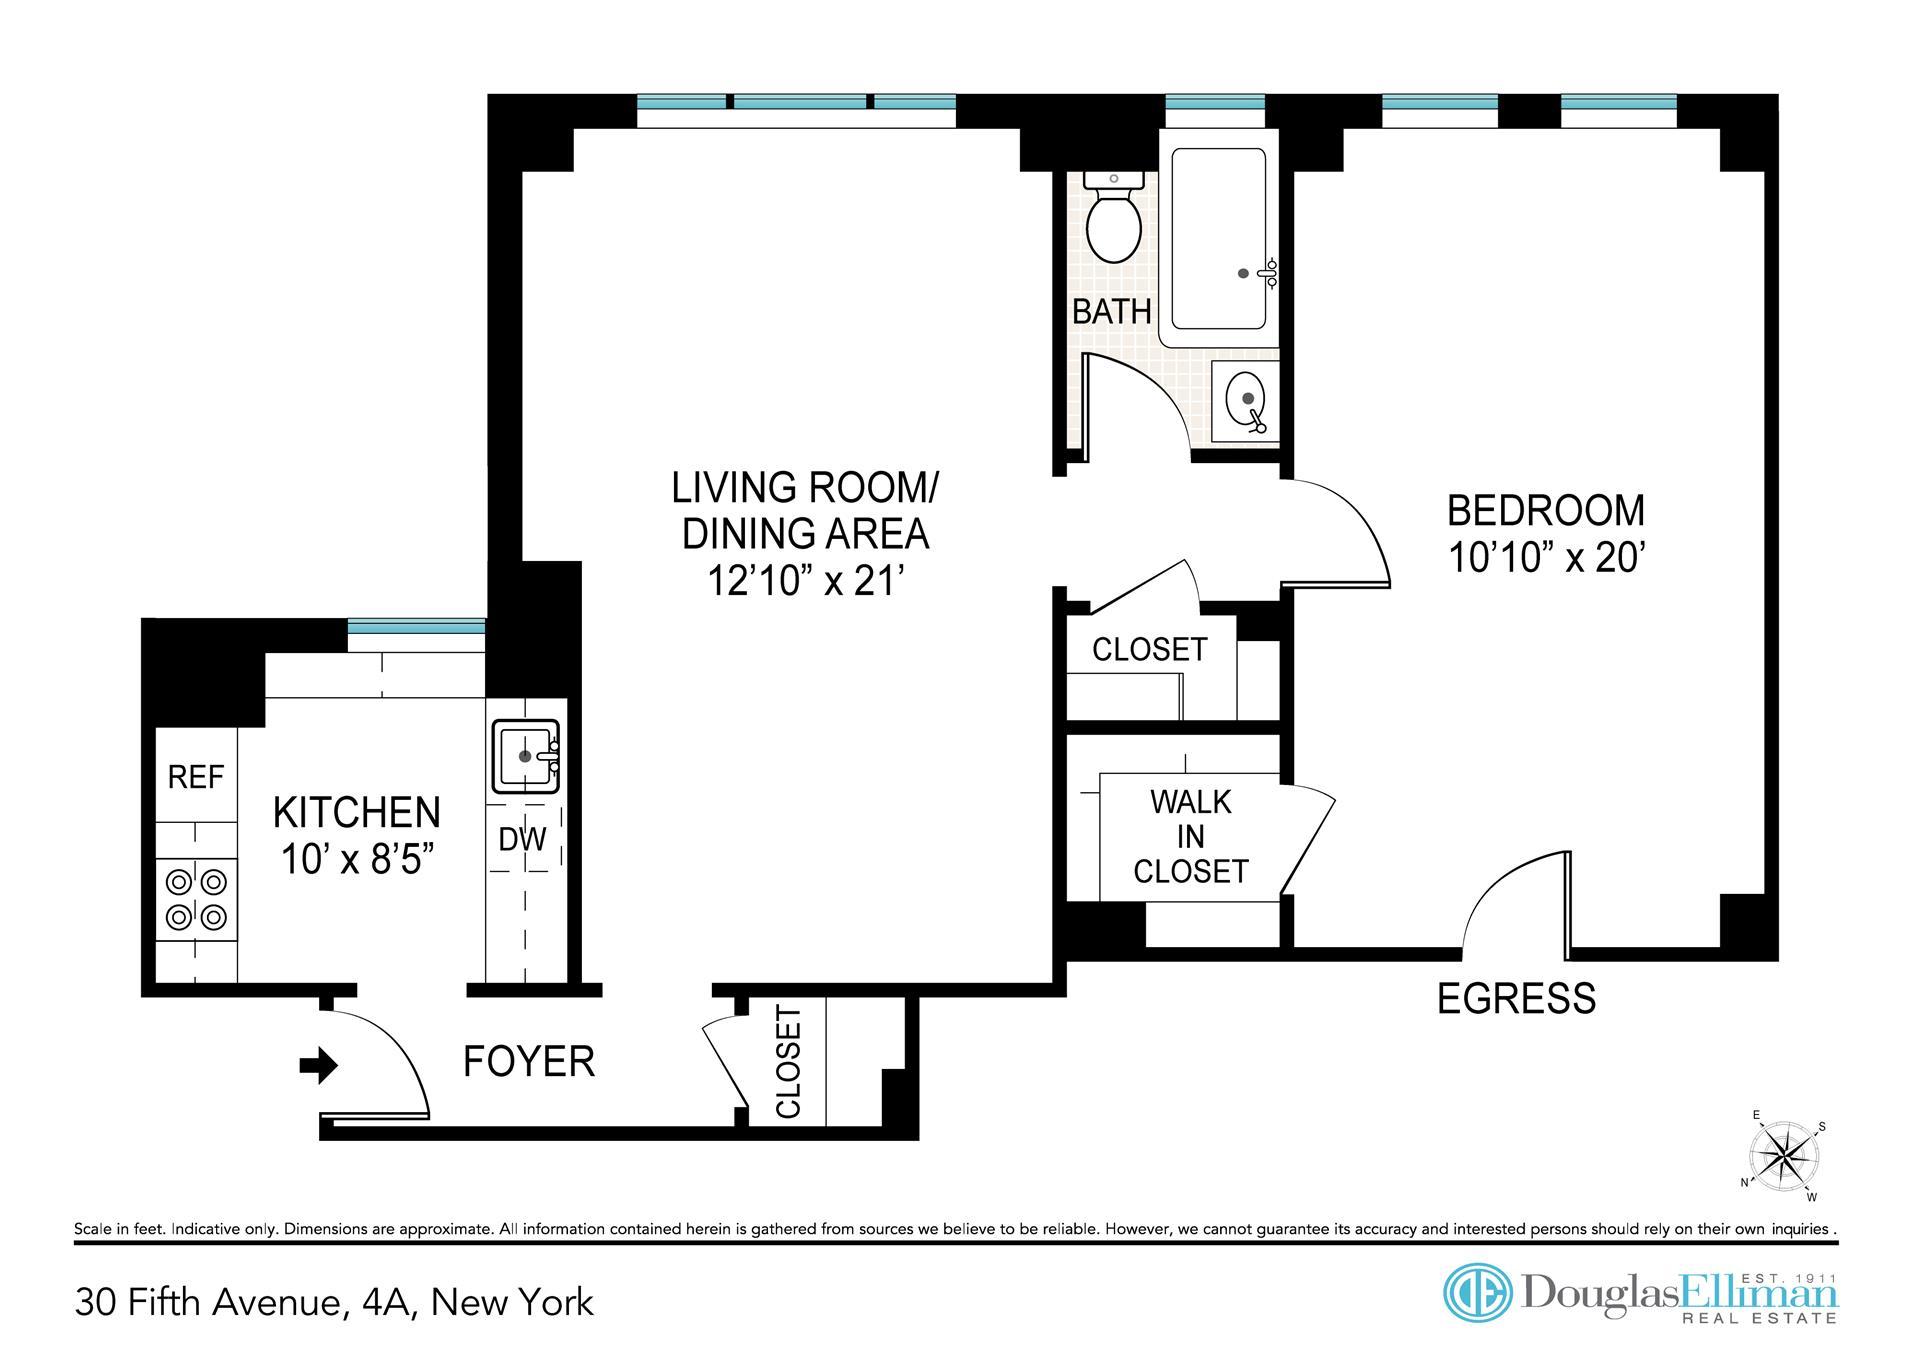 Floor plan of 30 Fifth Avenue, 4A - Greenwich Village, New York